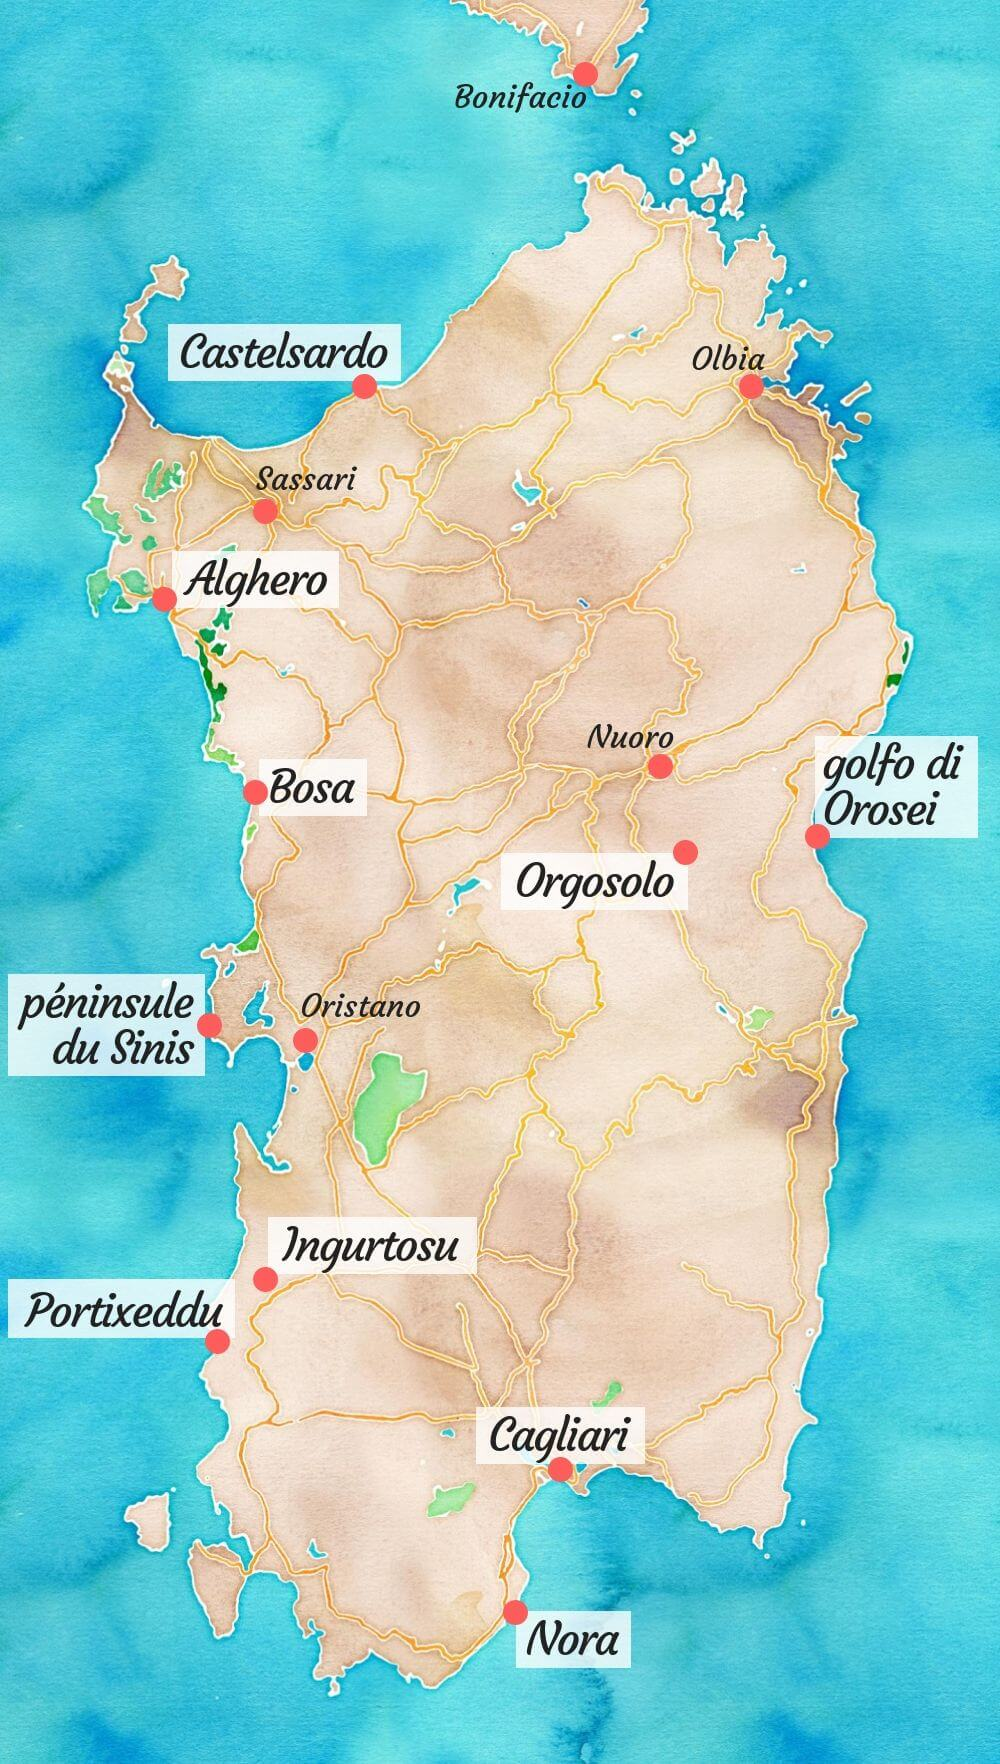 Carte touristique de la Sardaigne.